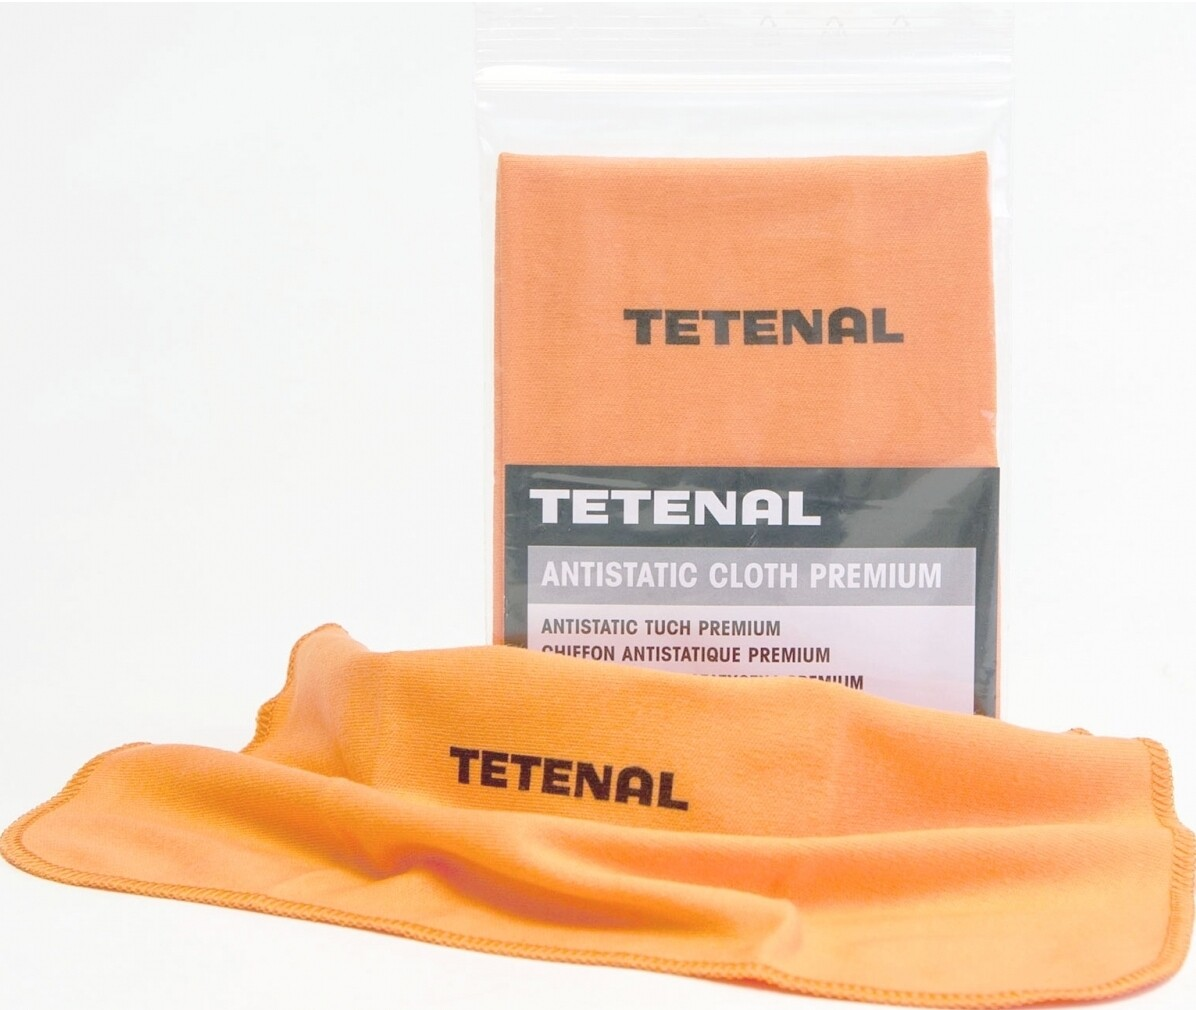 Tetenal Antistatic Polishing Cloth Premium 29 x 30 cm - 101317